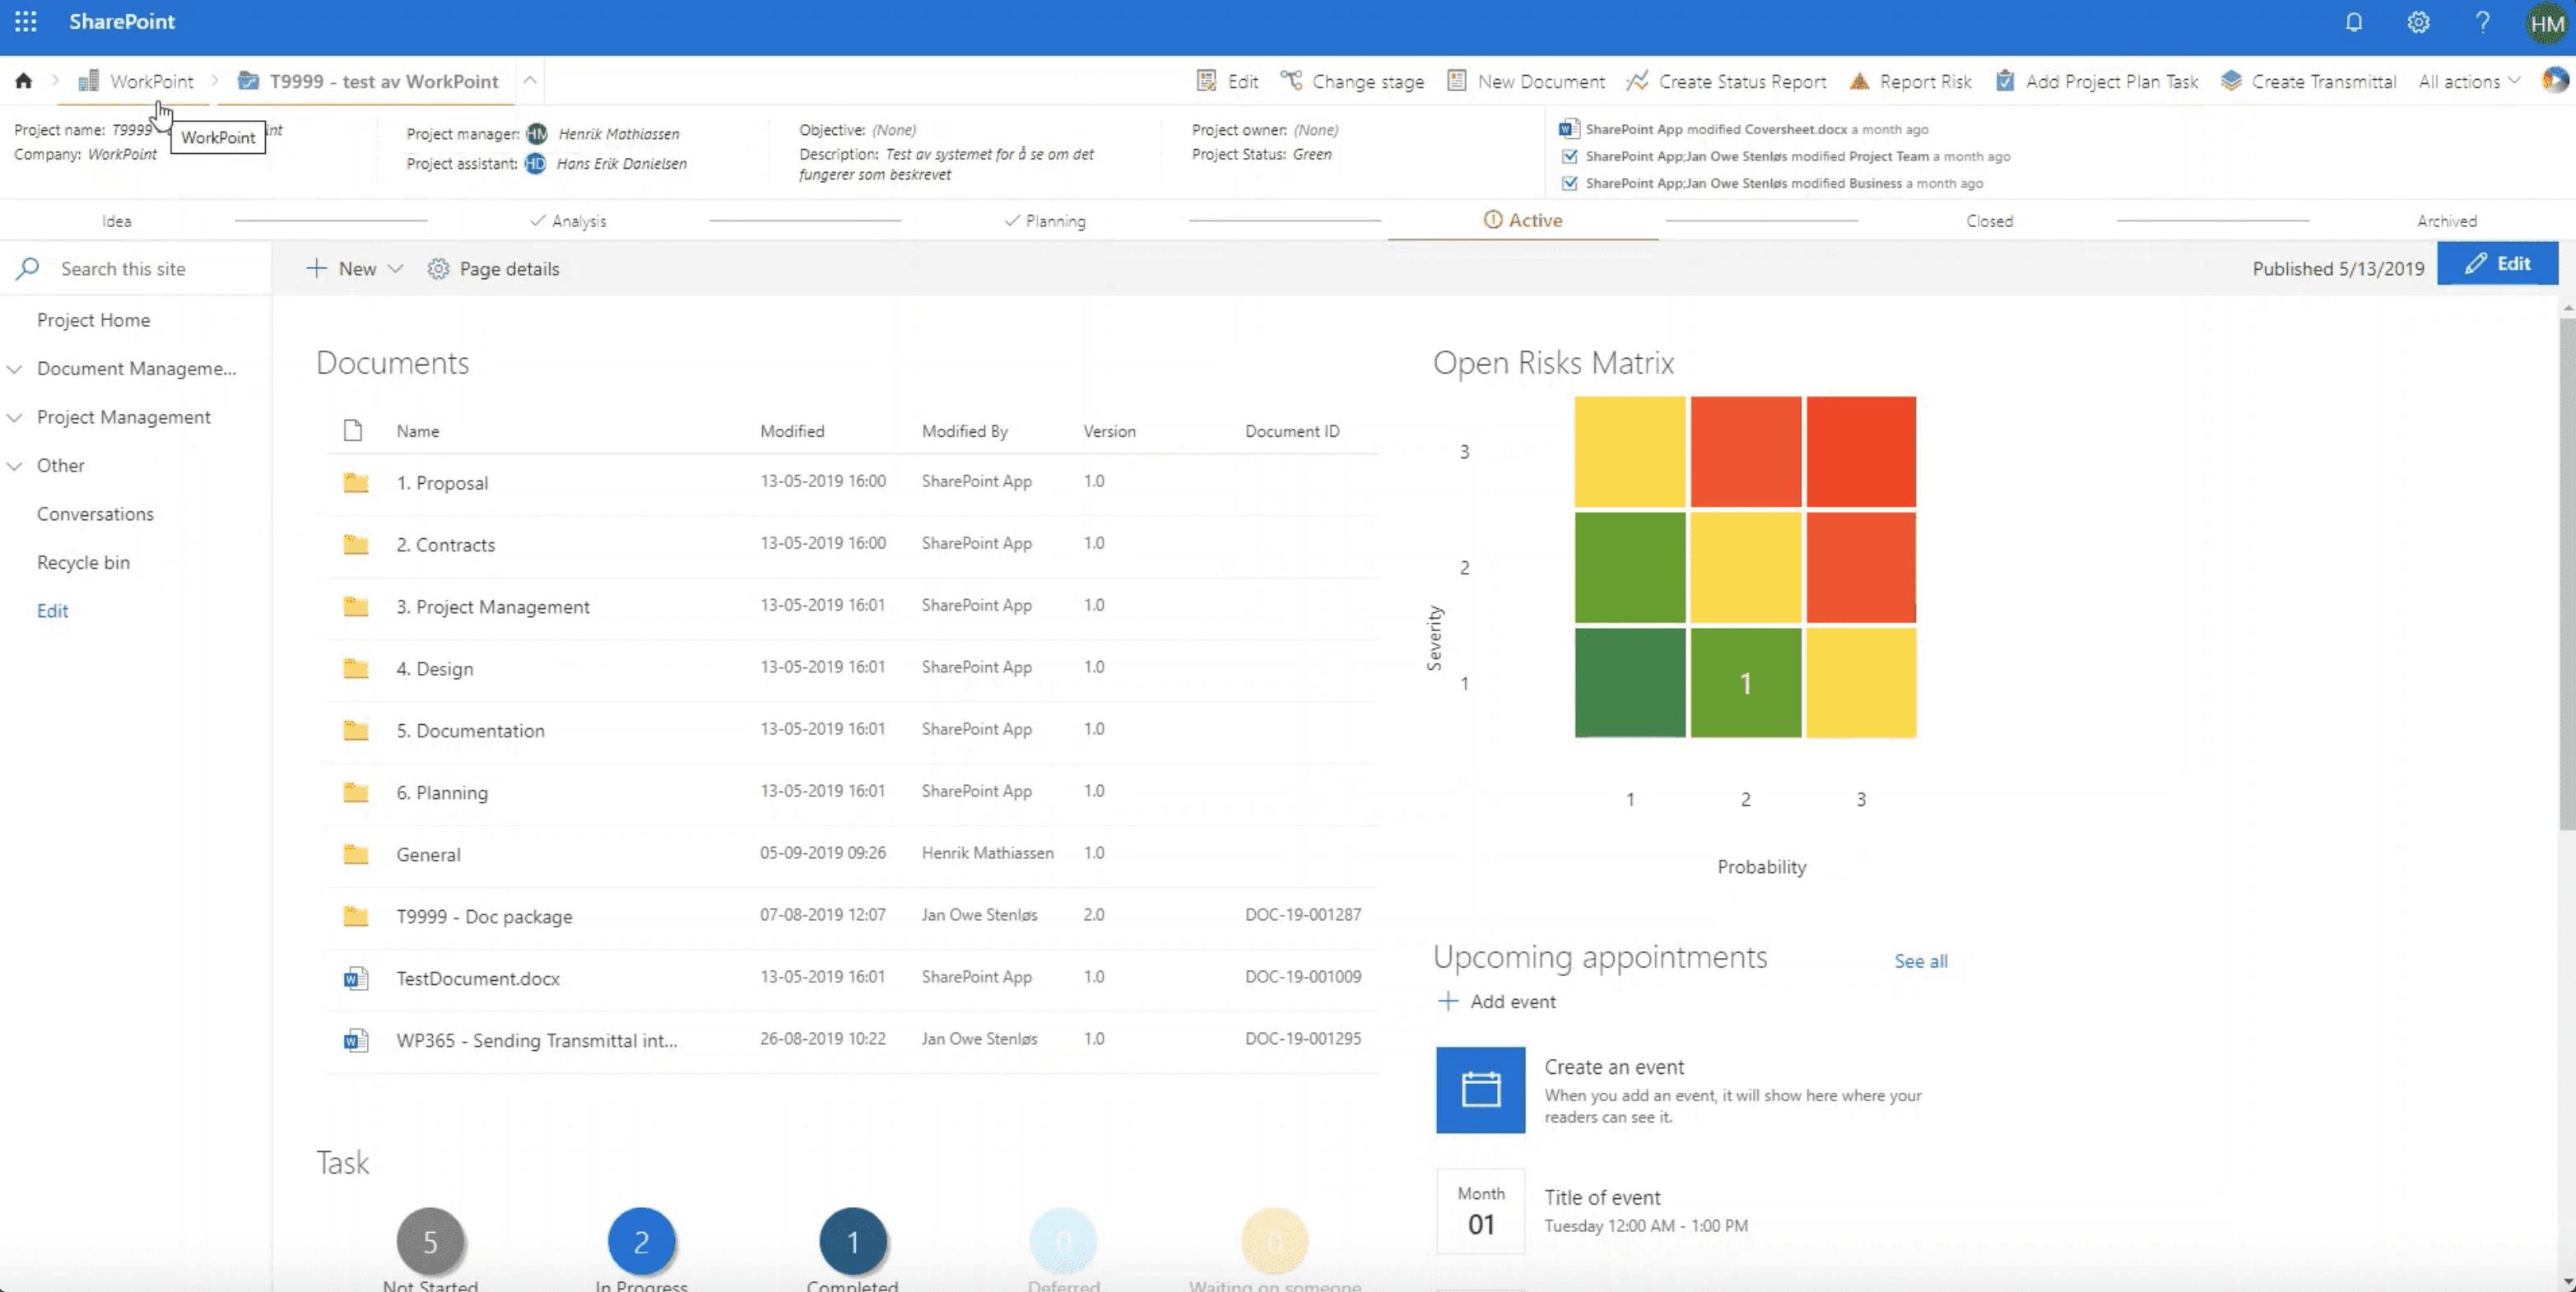 SharePoint løsning til projektstyring